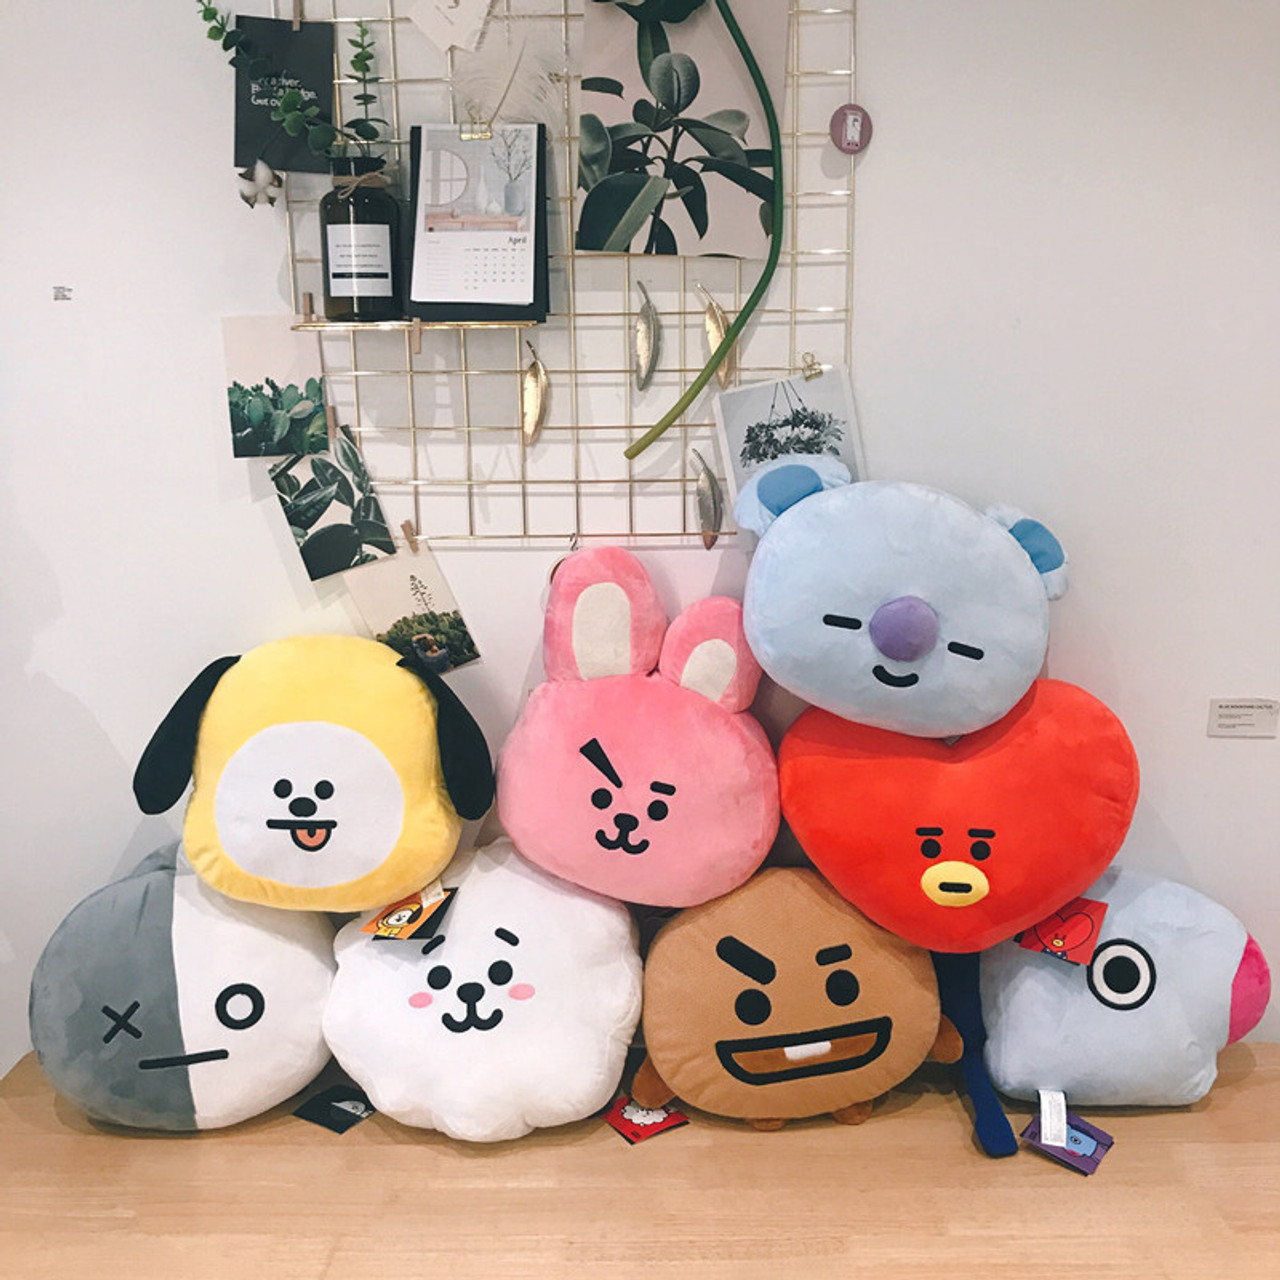 bts doll bt21 toys for children soft plush girls stuff stuffed animals anime pillow rabbits tata van cooky chimmy shooky koya